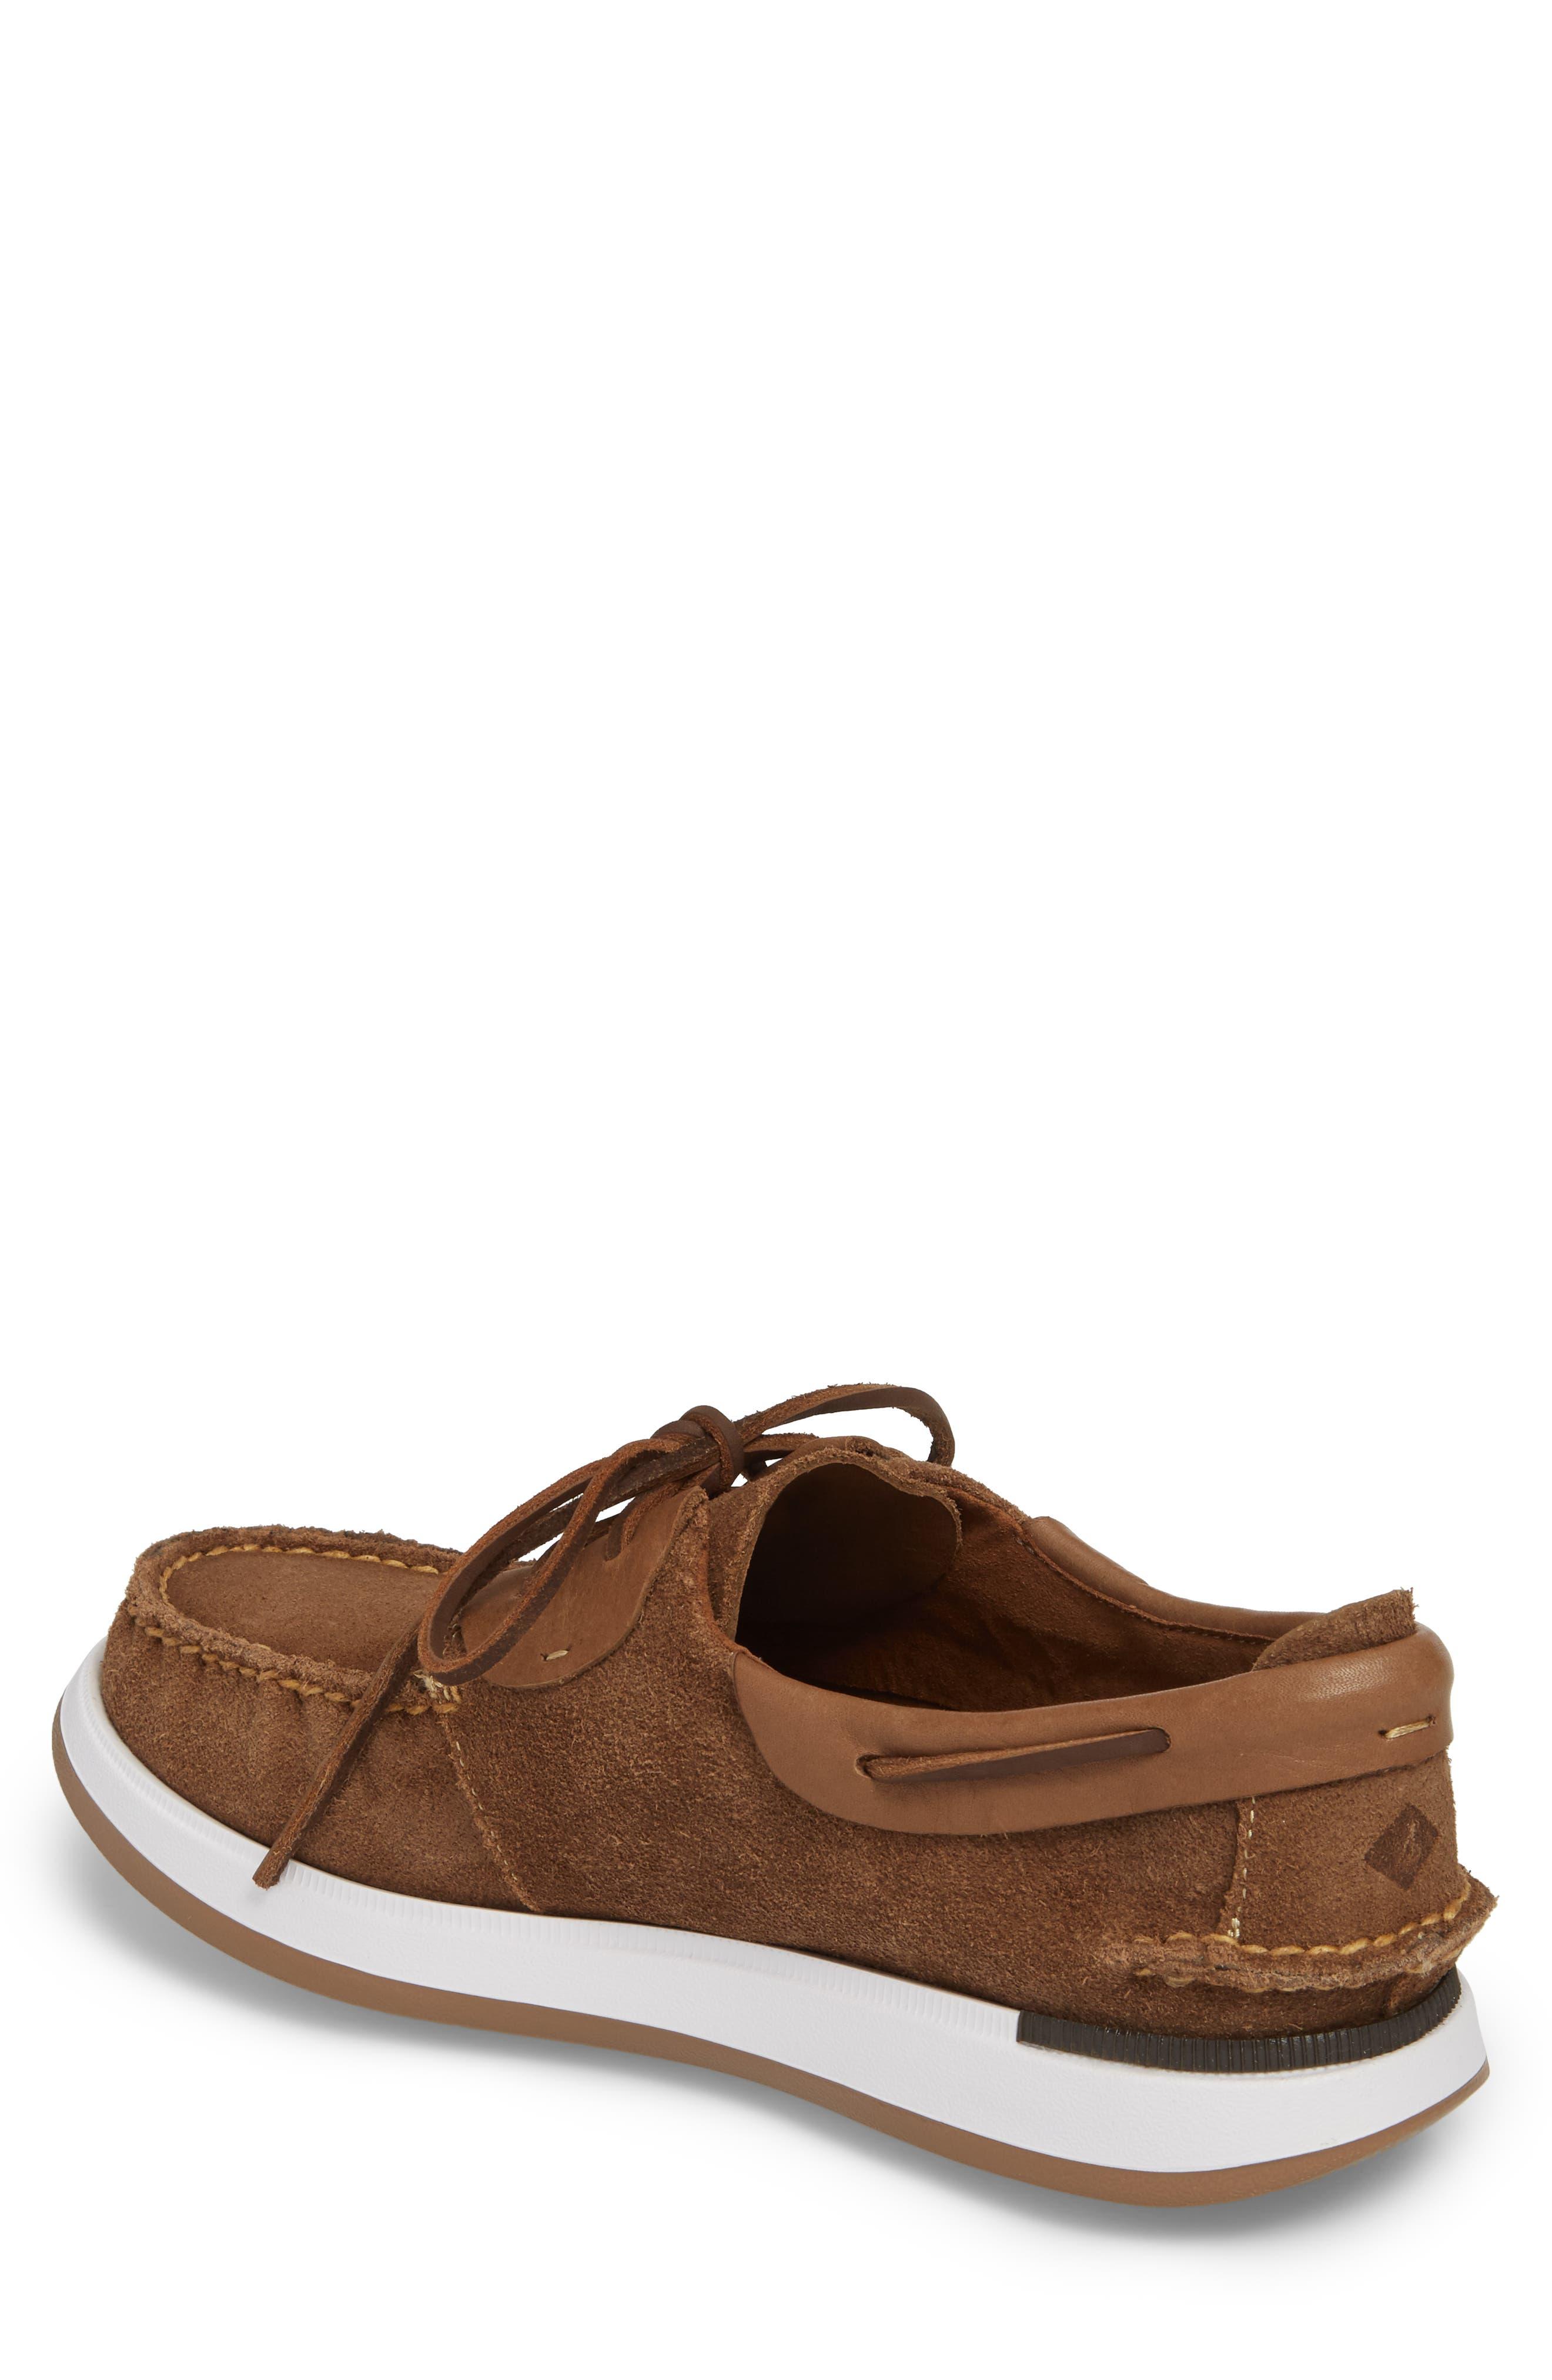 Caspian Boat Shoe,                             Alternate thumbnail 2, color,                             Tan Leather/ Suede